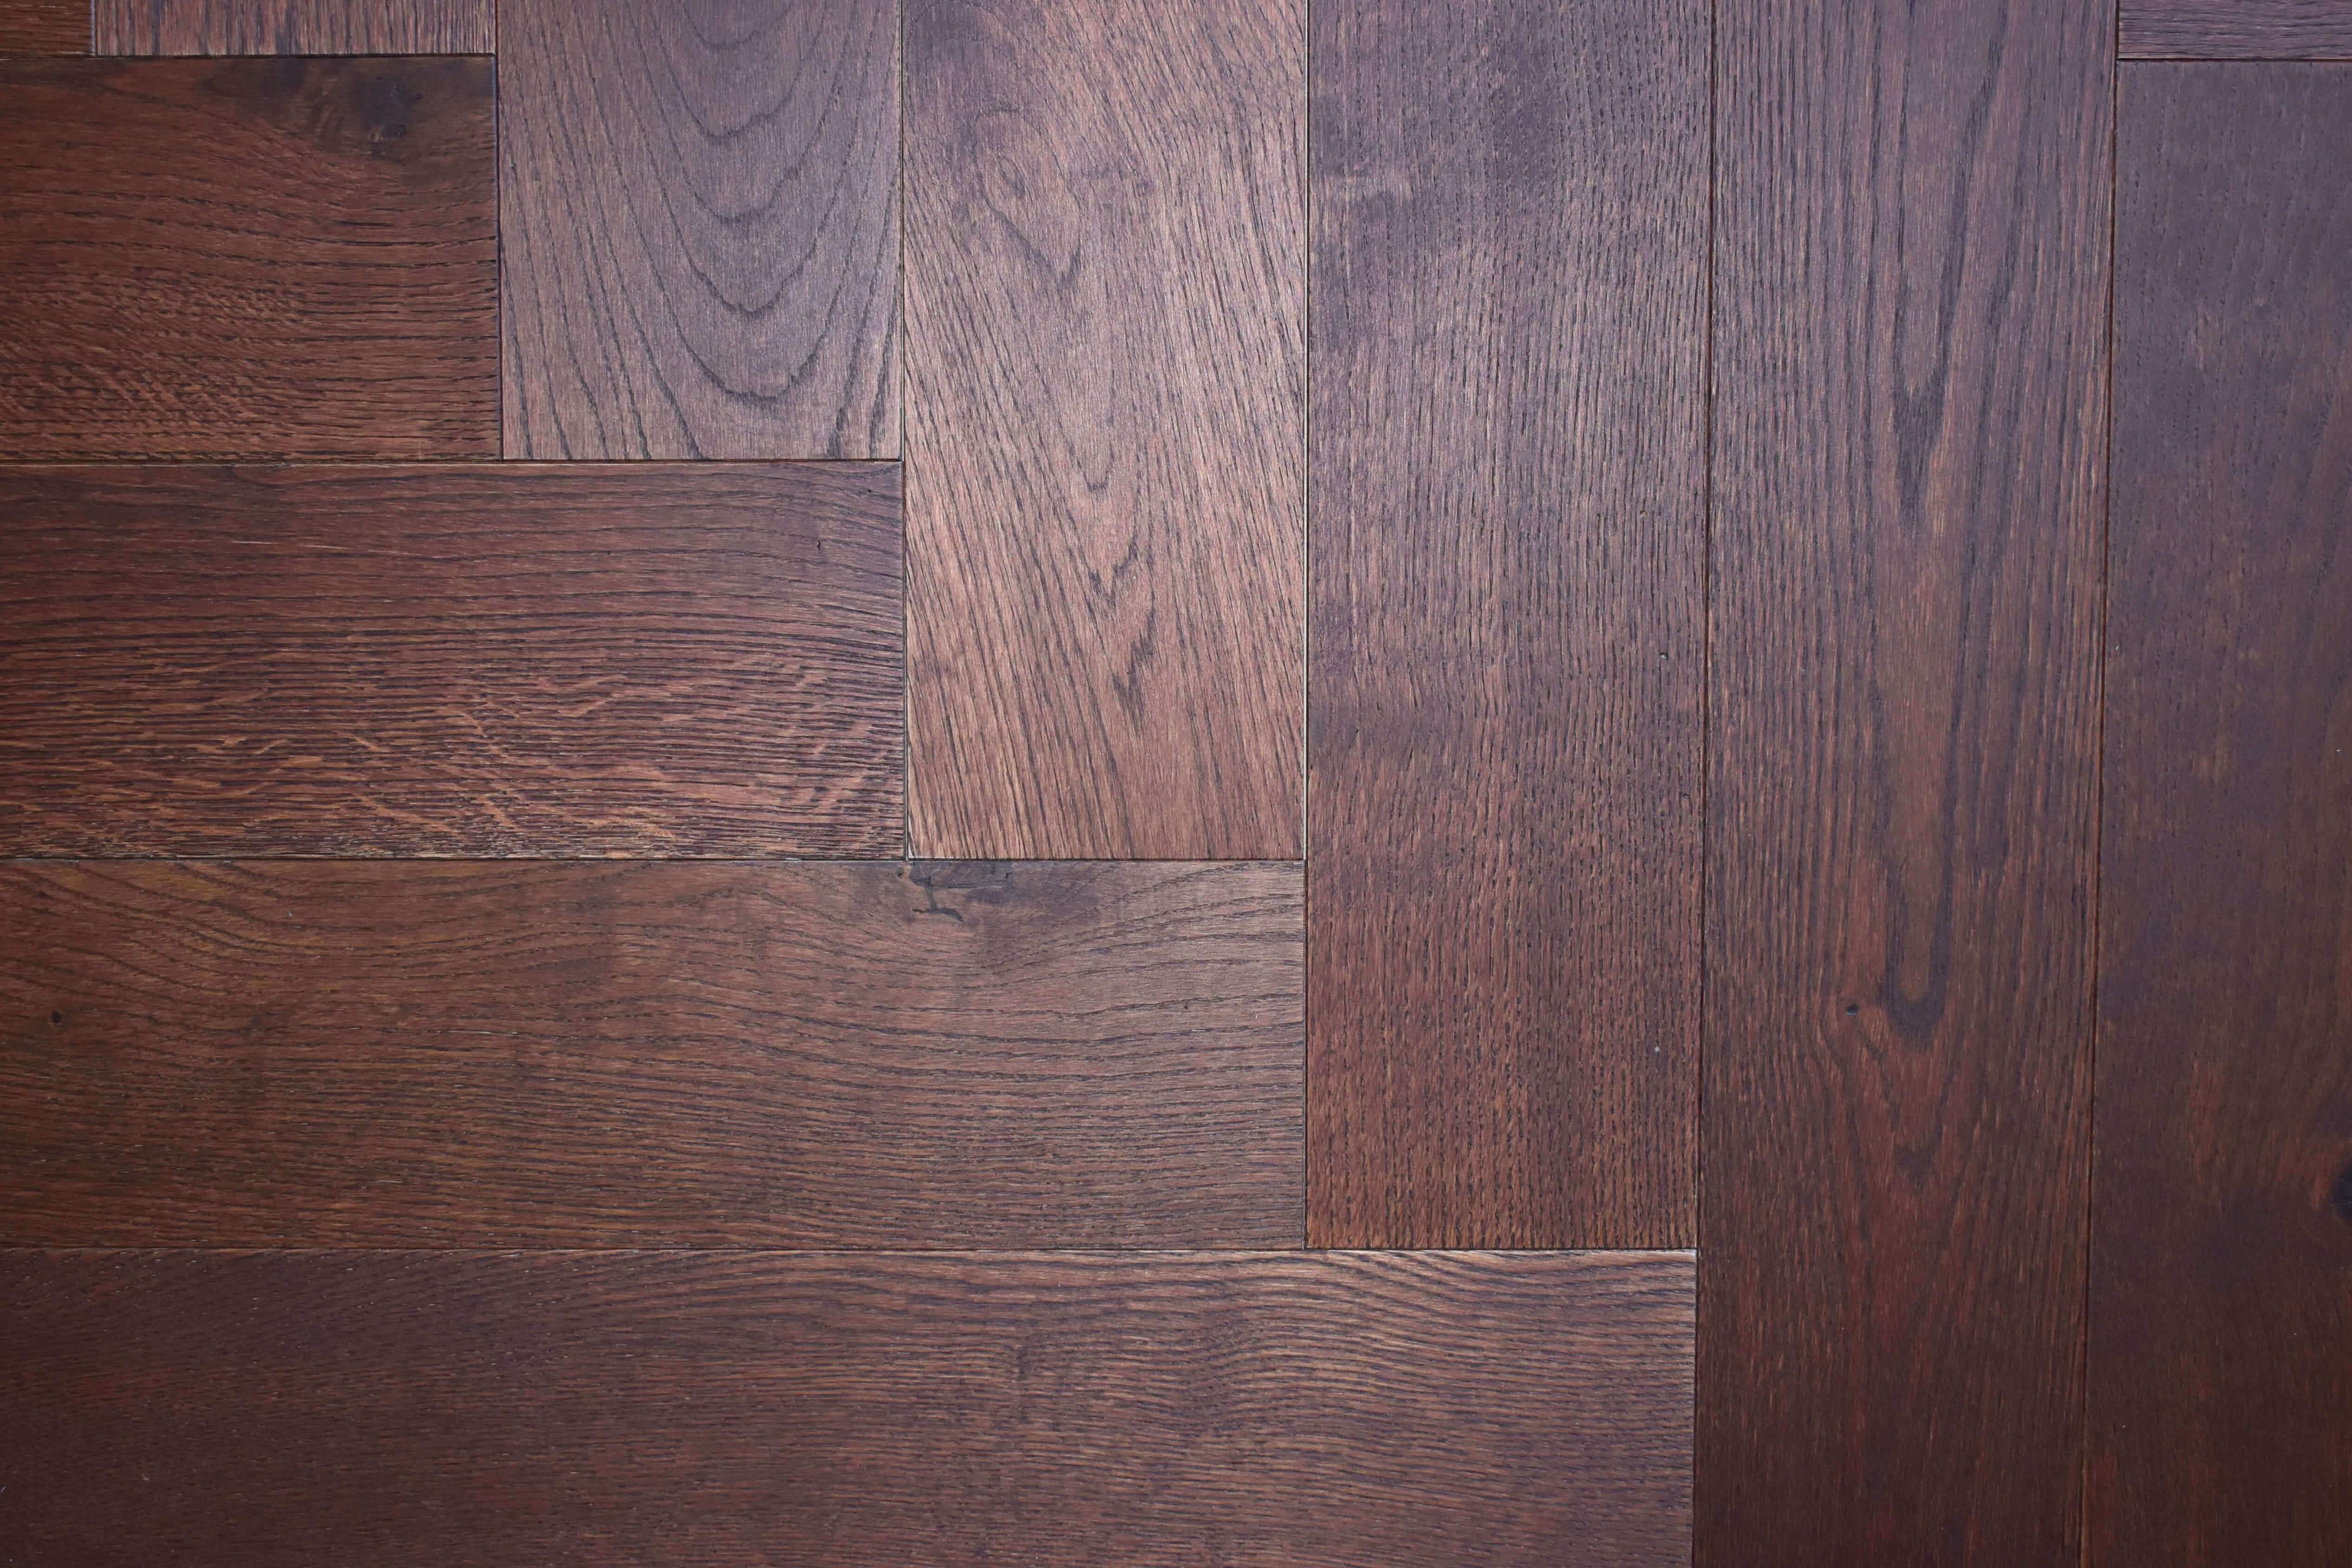 Herringbone Flooring In Private Country Home